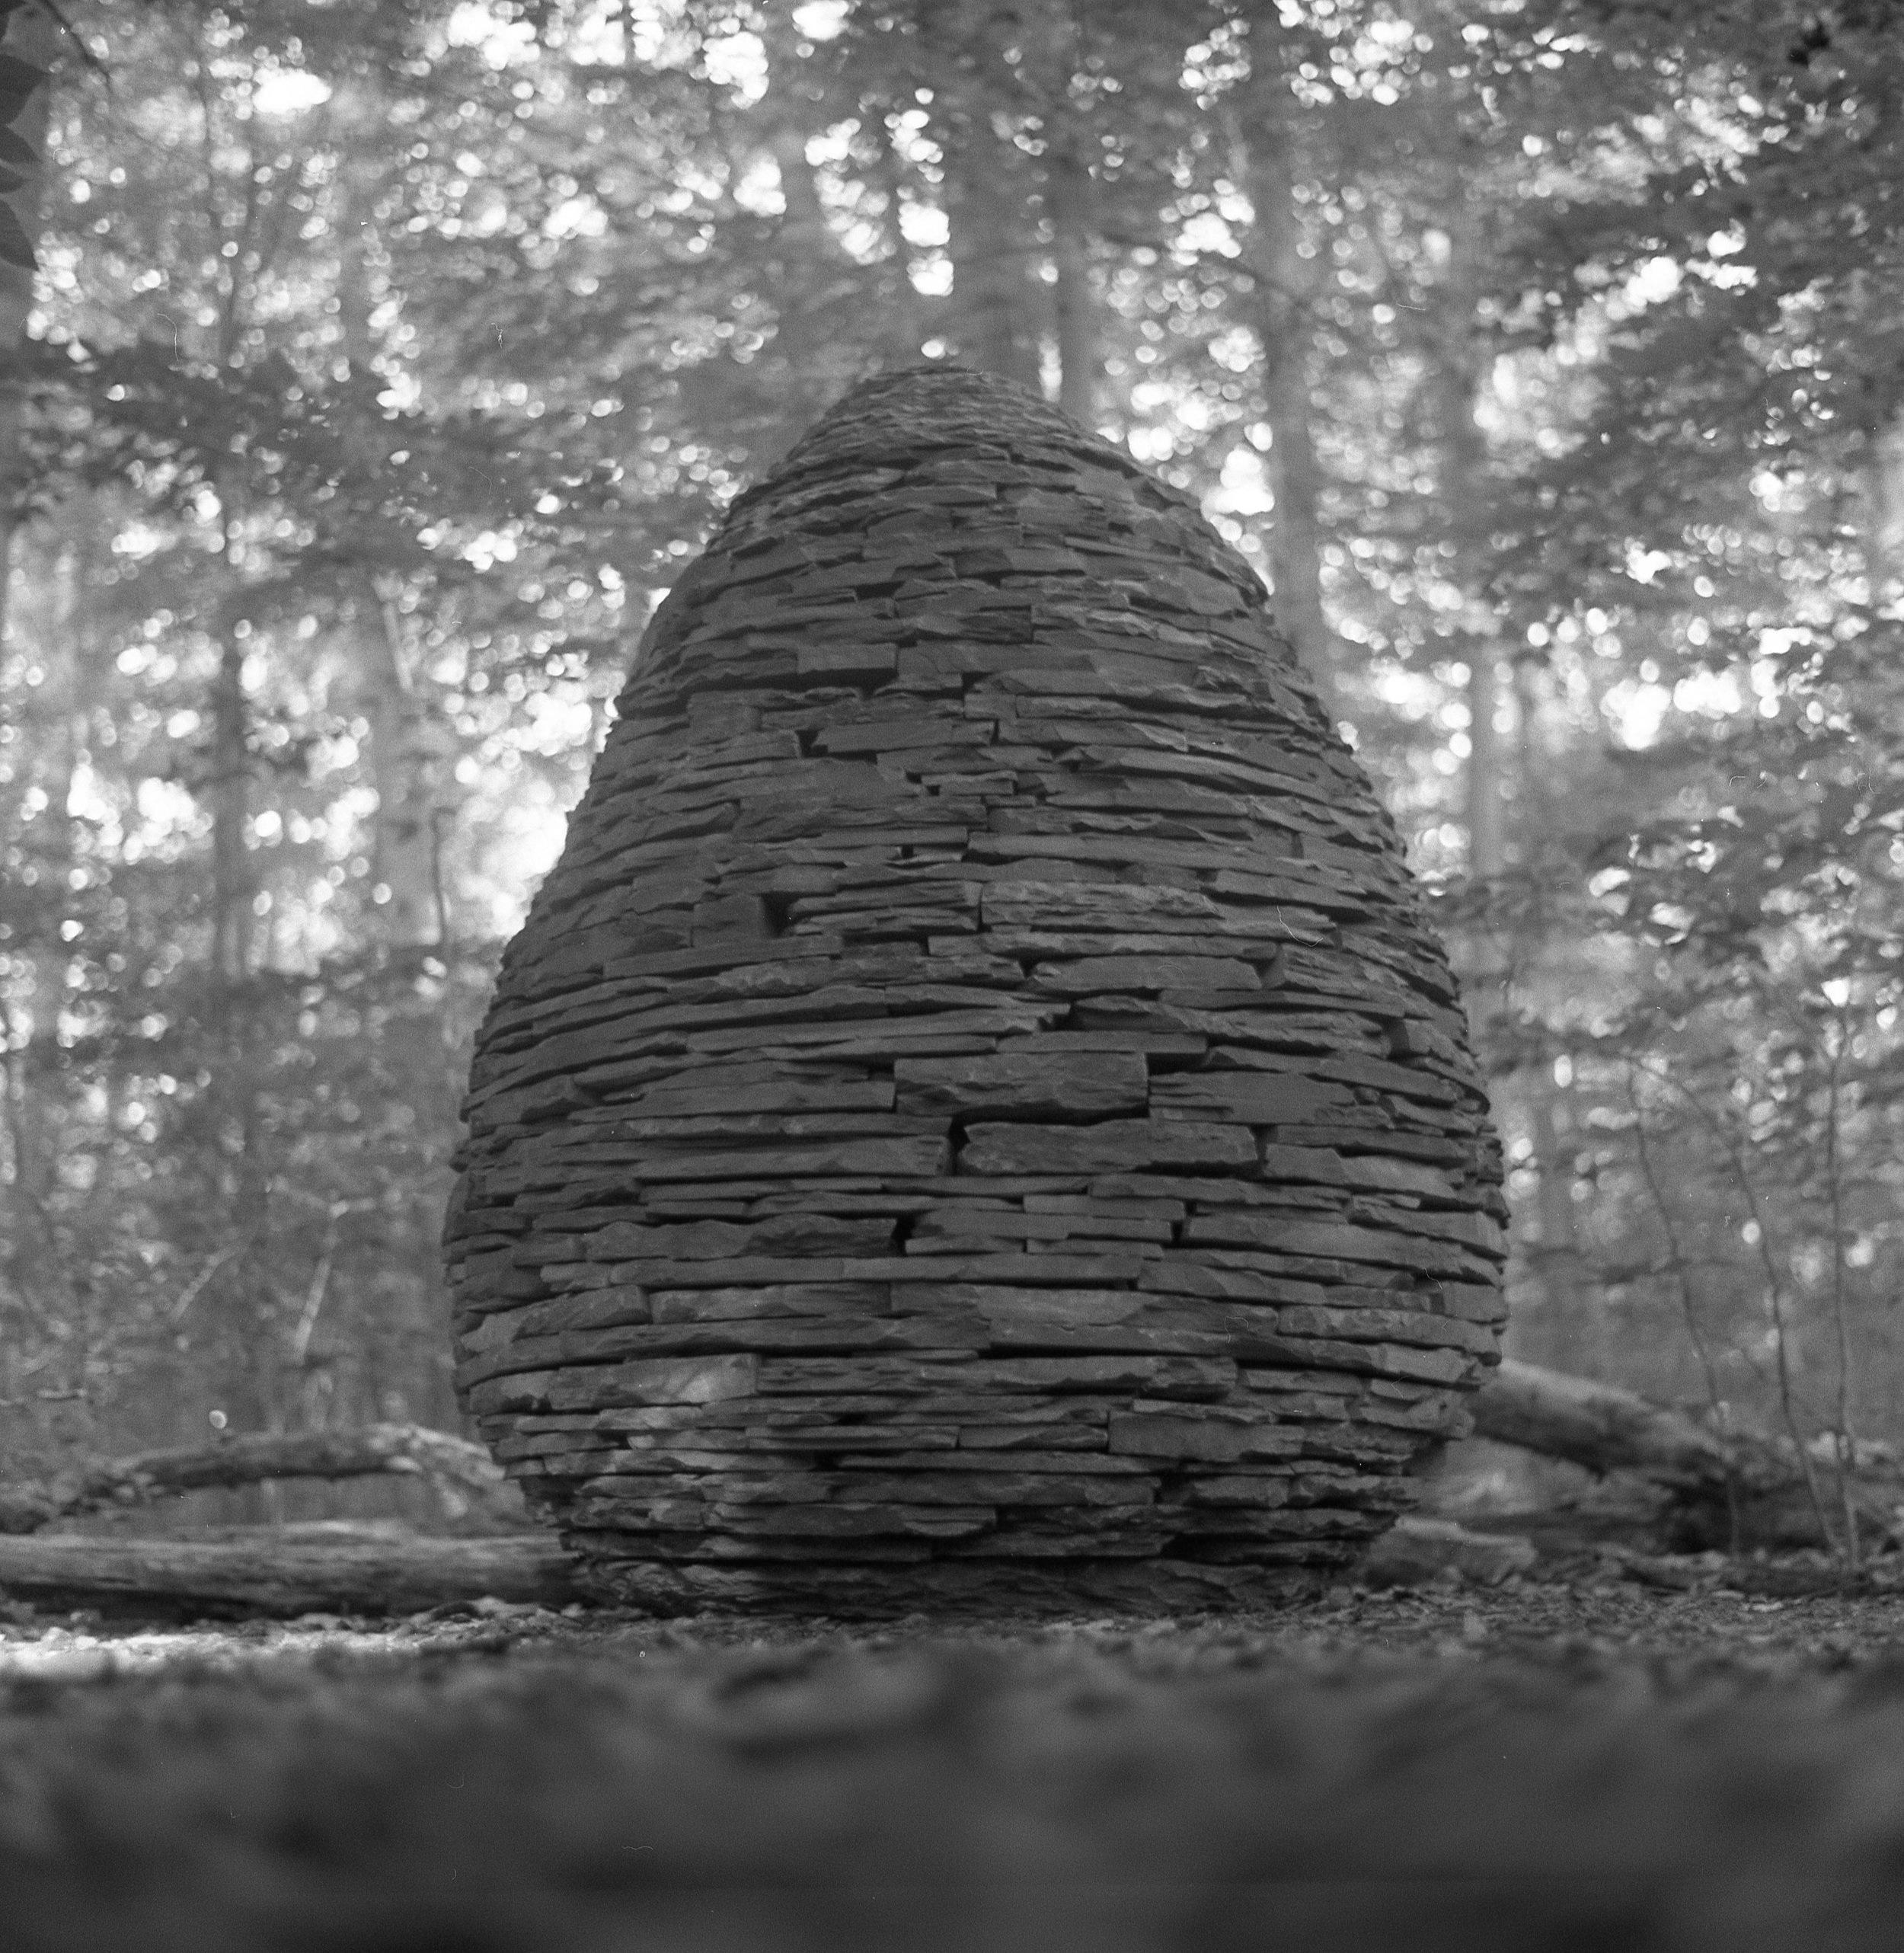 Sapsucker cairn, Ithaca